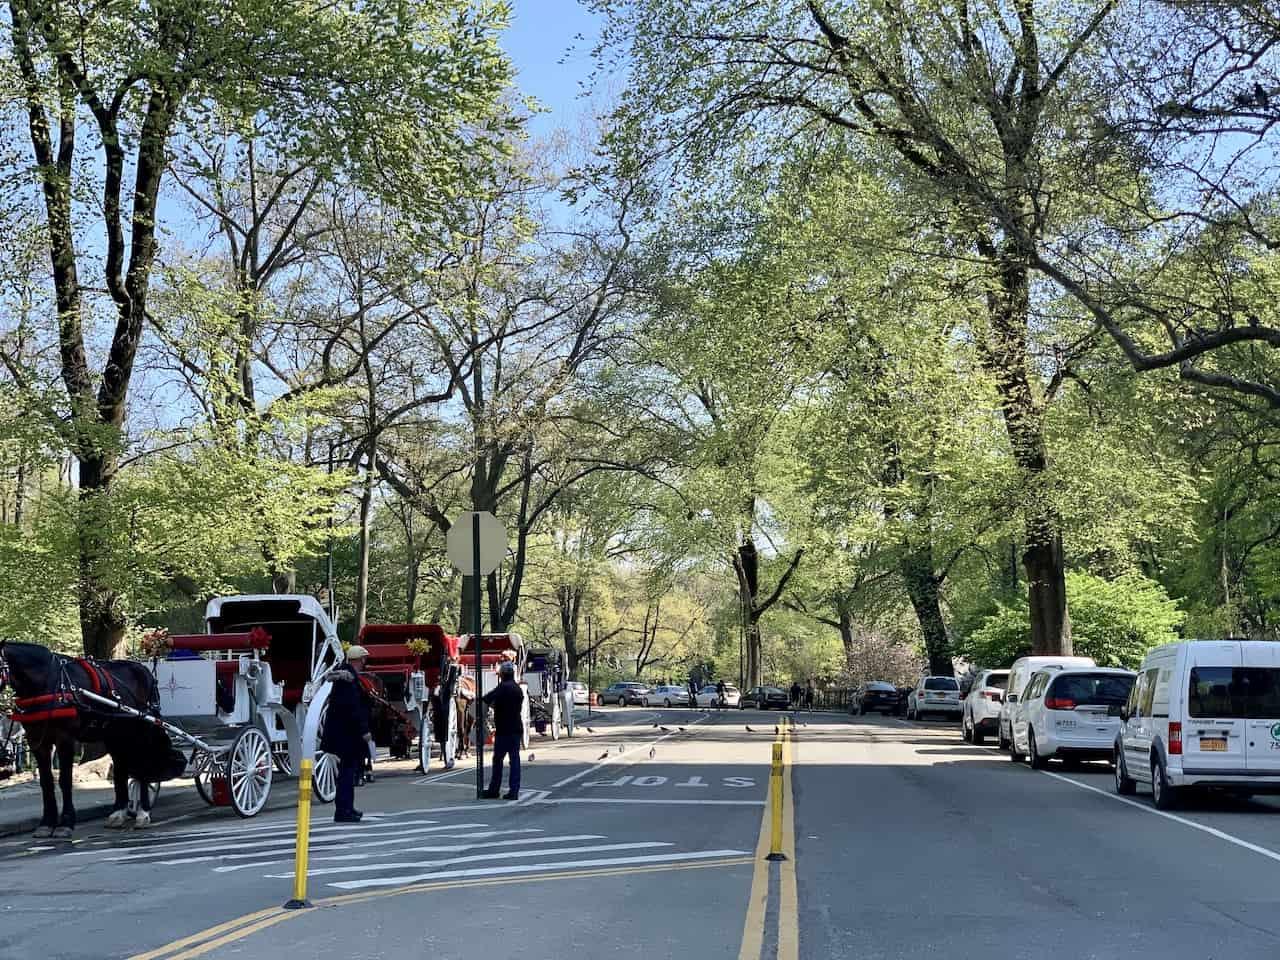 Grand Army Plaza Central Park